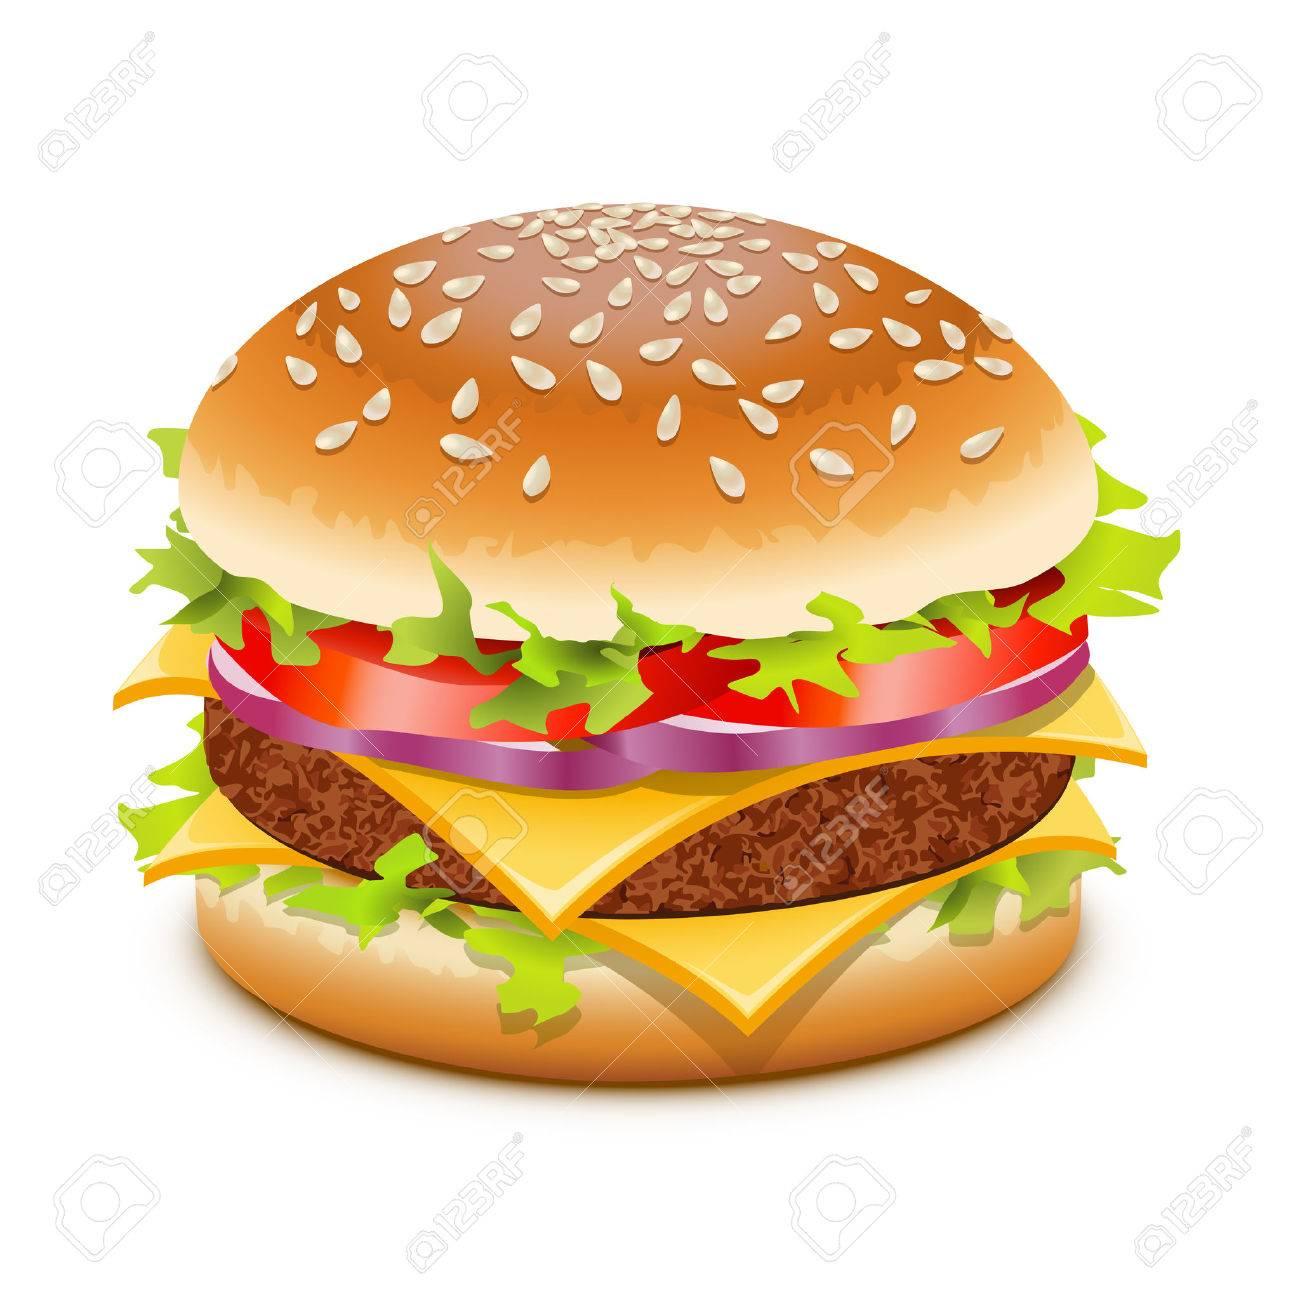 Cheeseburger, hamburger with cheese over white Stock Vector - 11151094